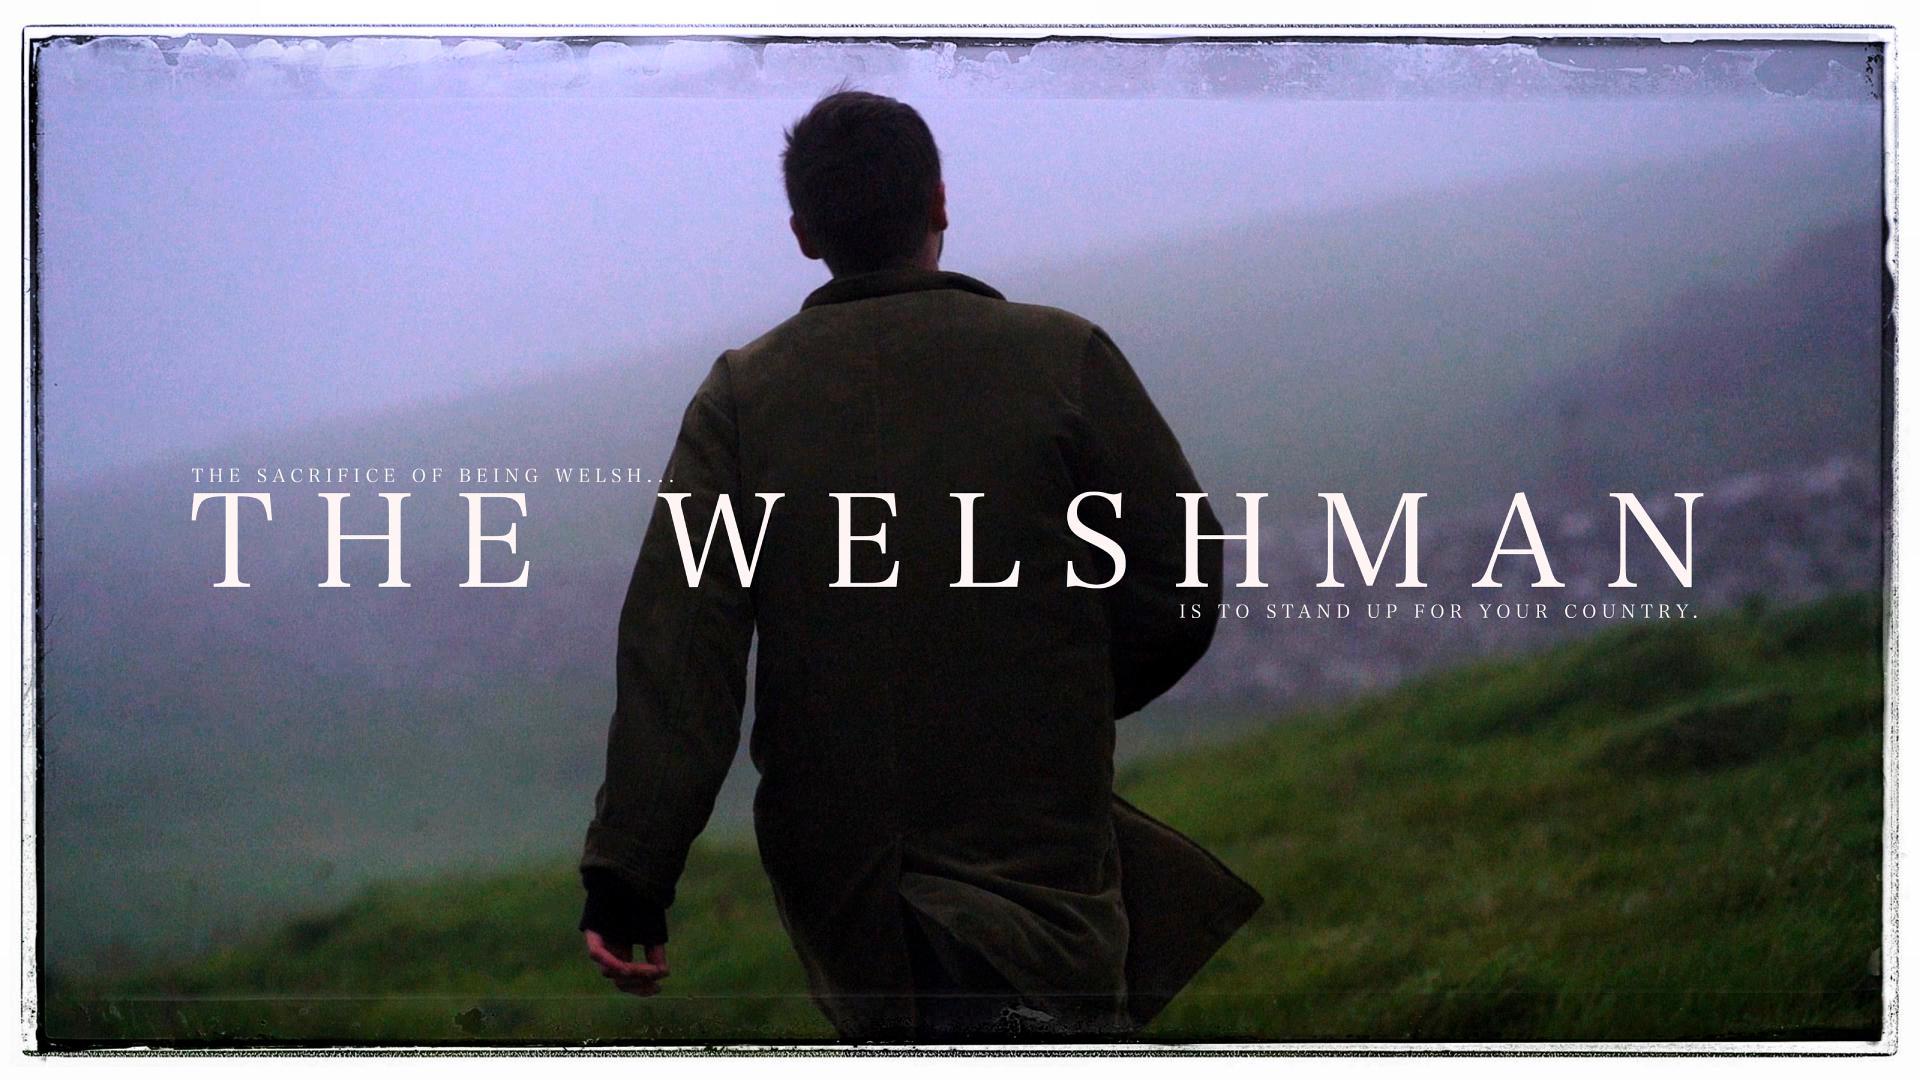 The Welshman